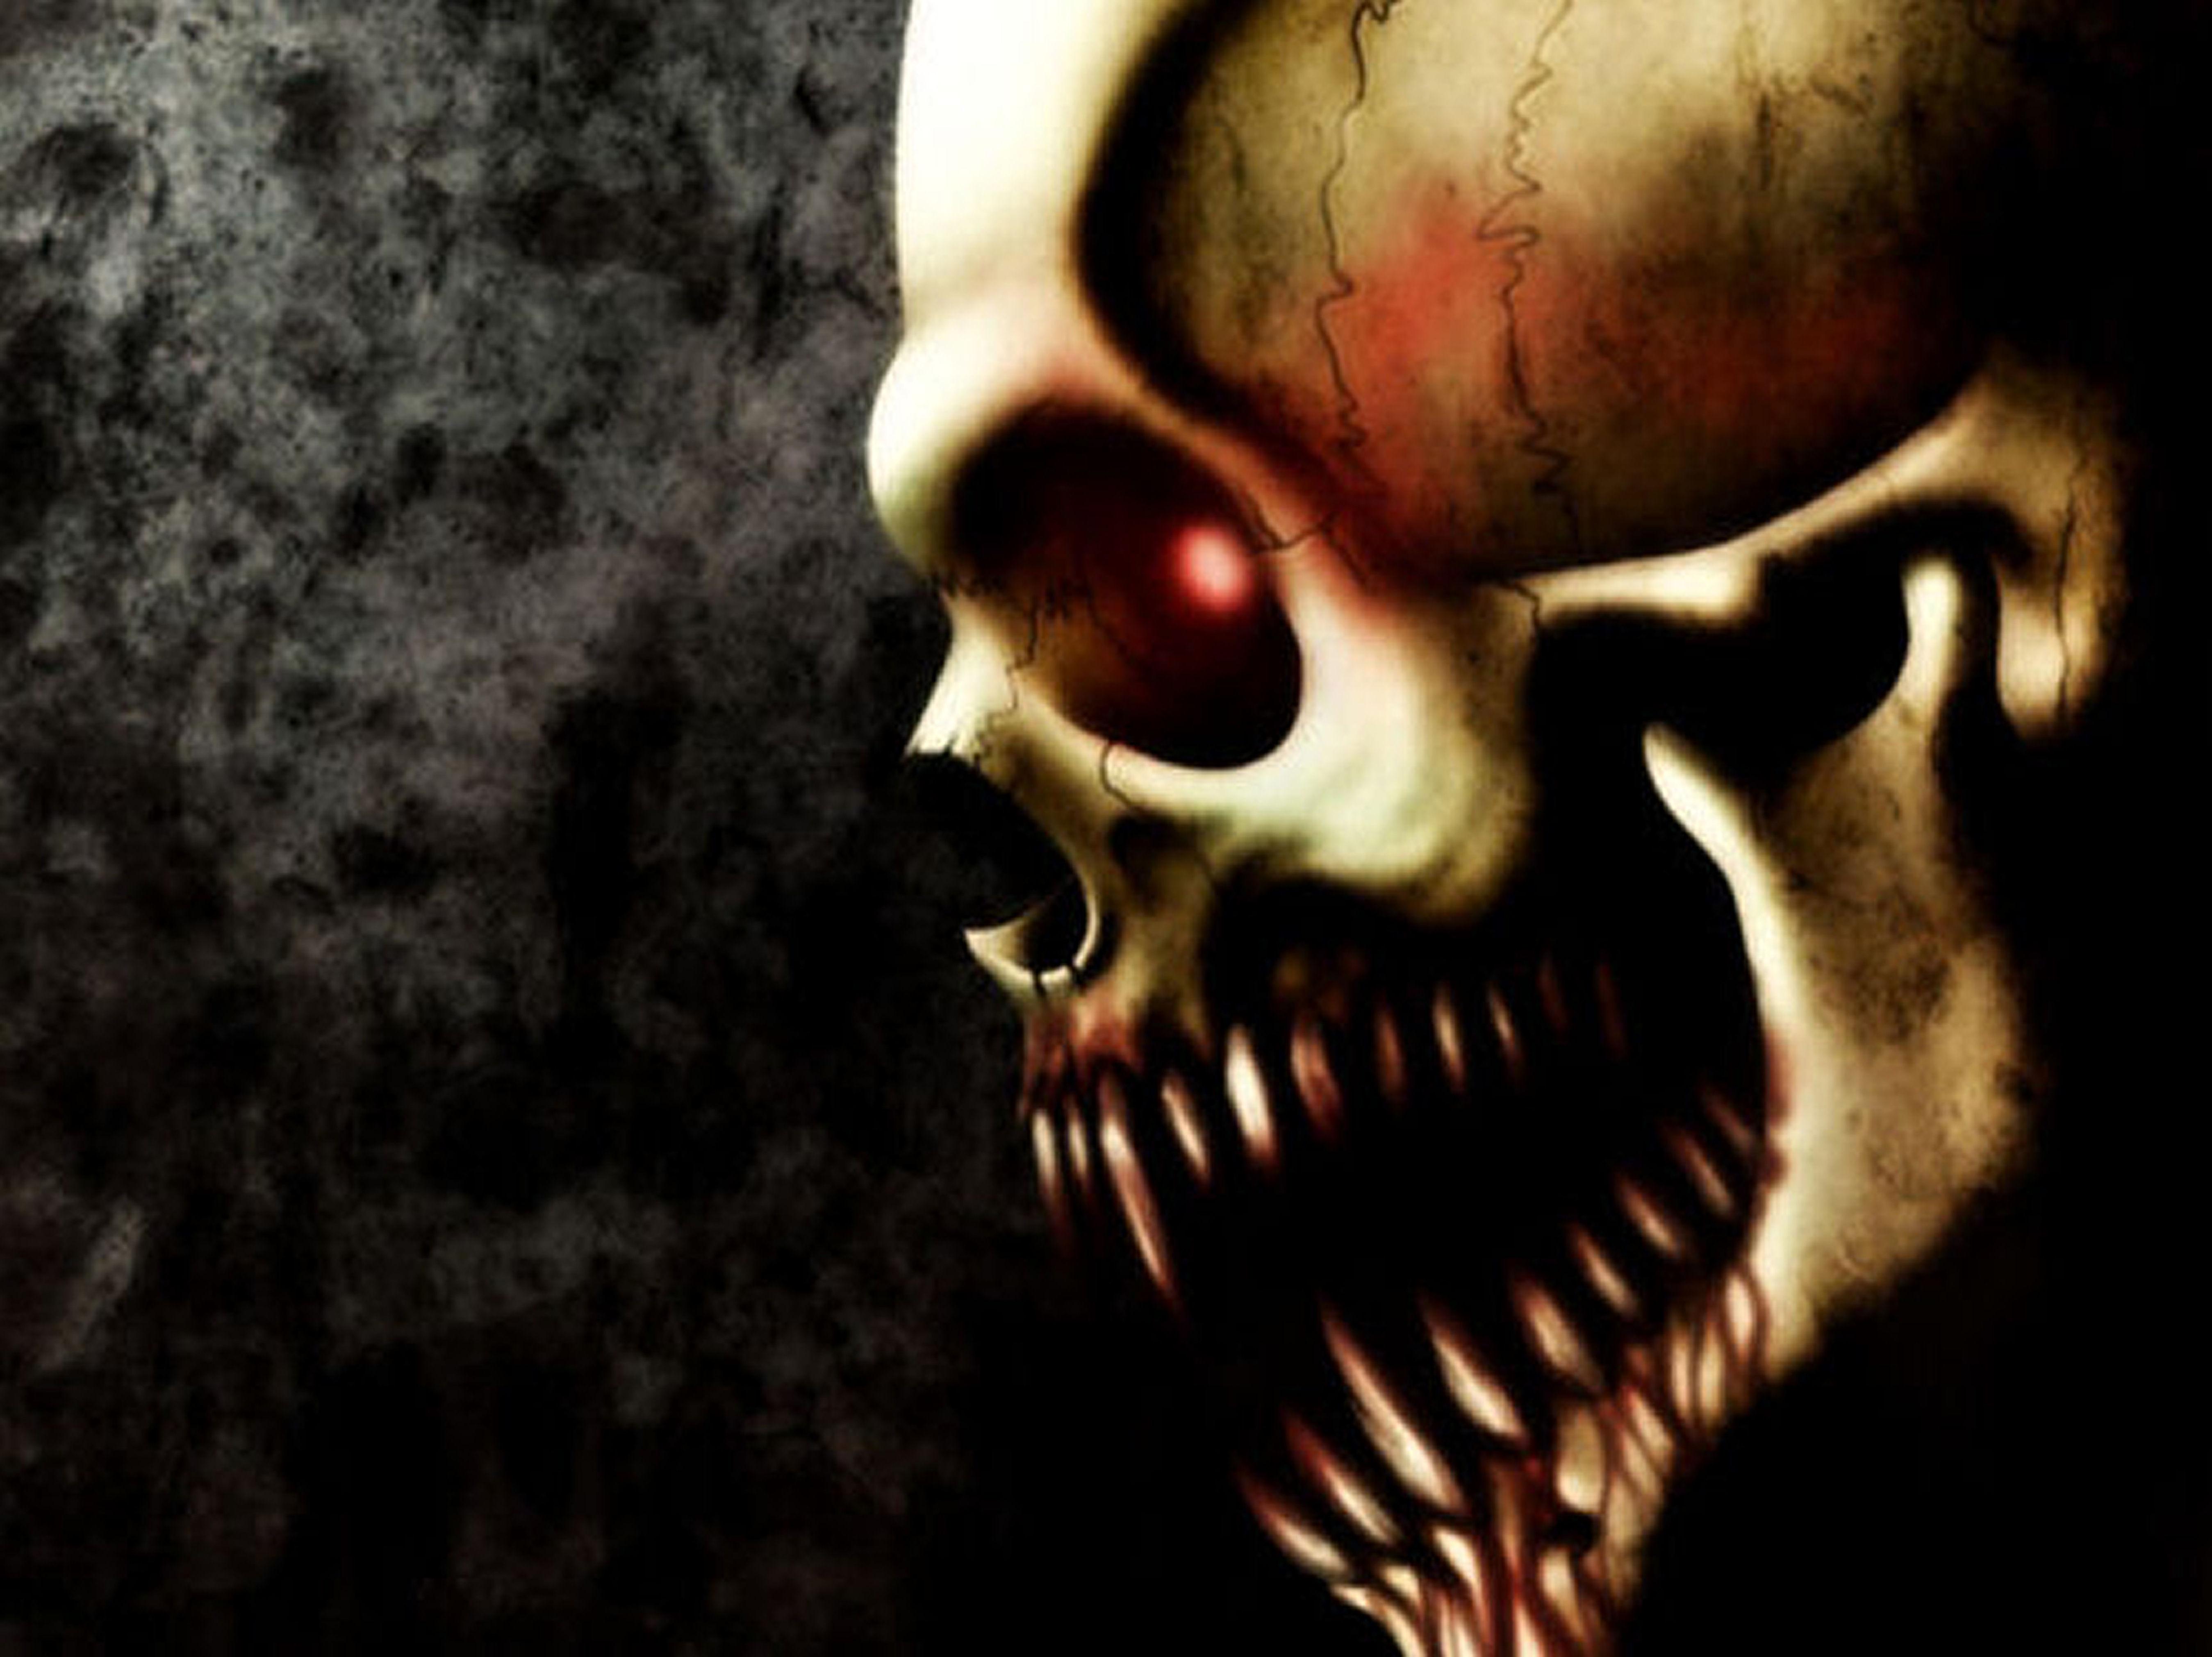 Evil Skull Skull Cell Phone Wallpapers Abstract 5396x4043